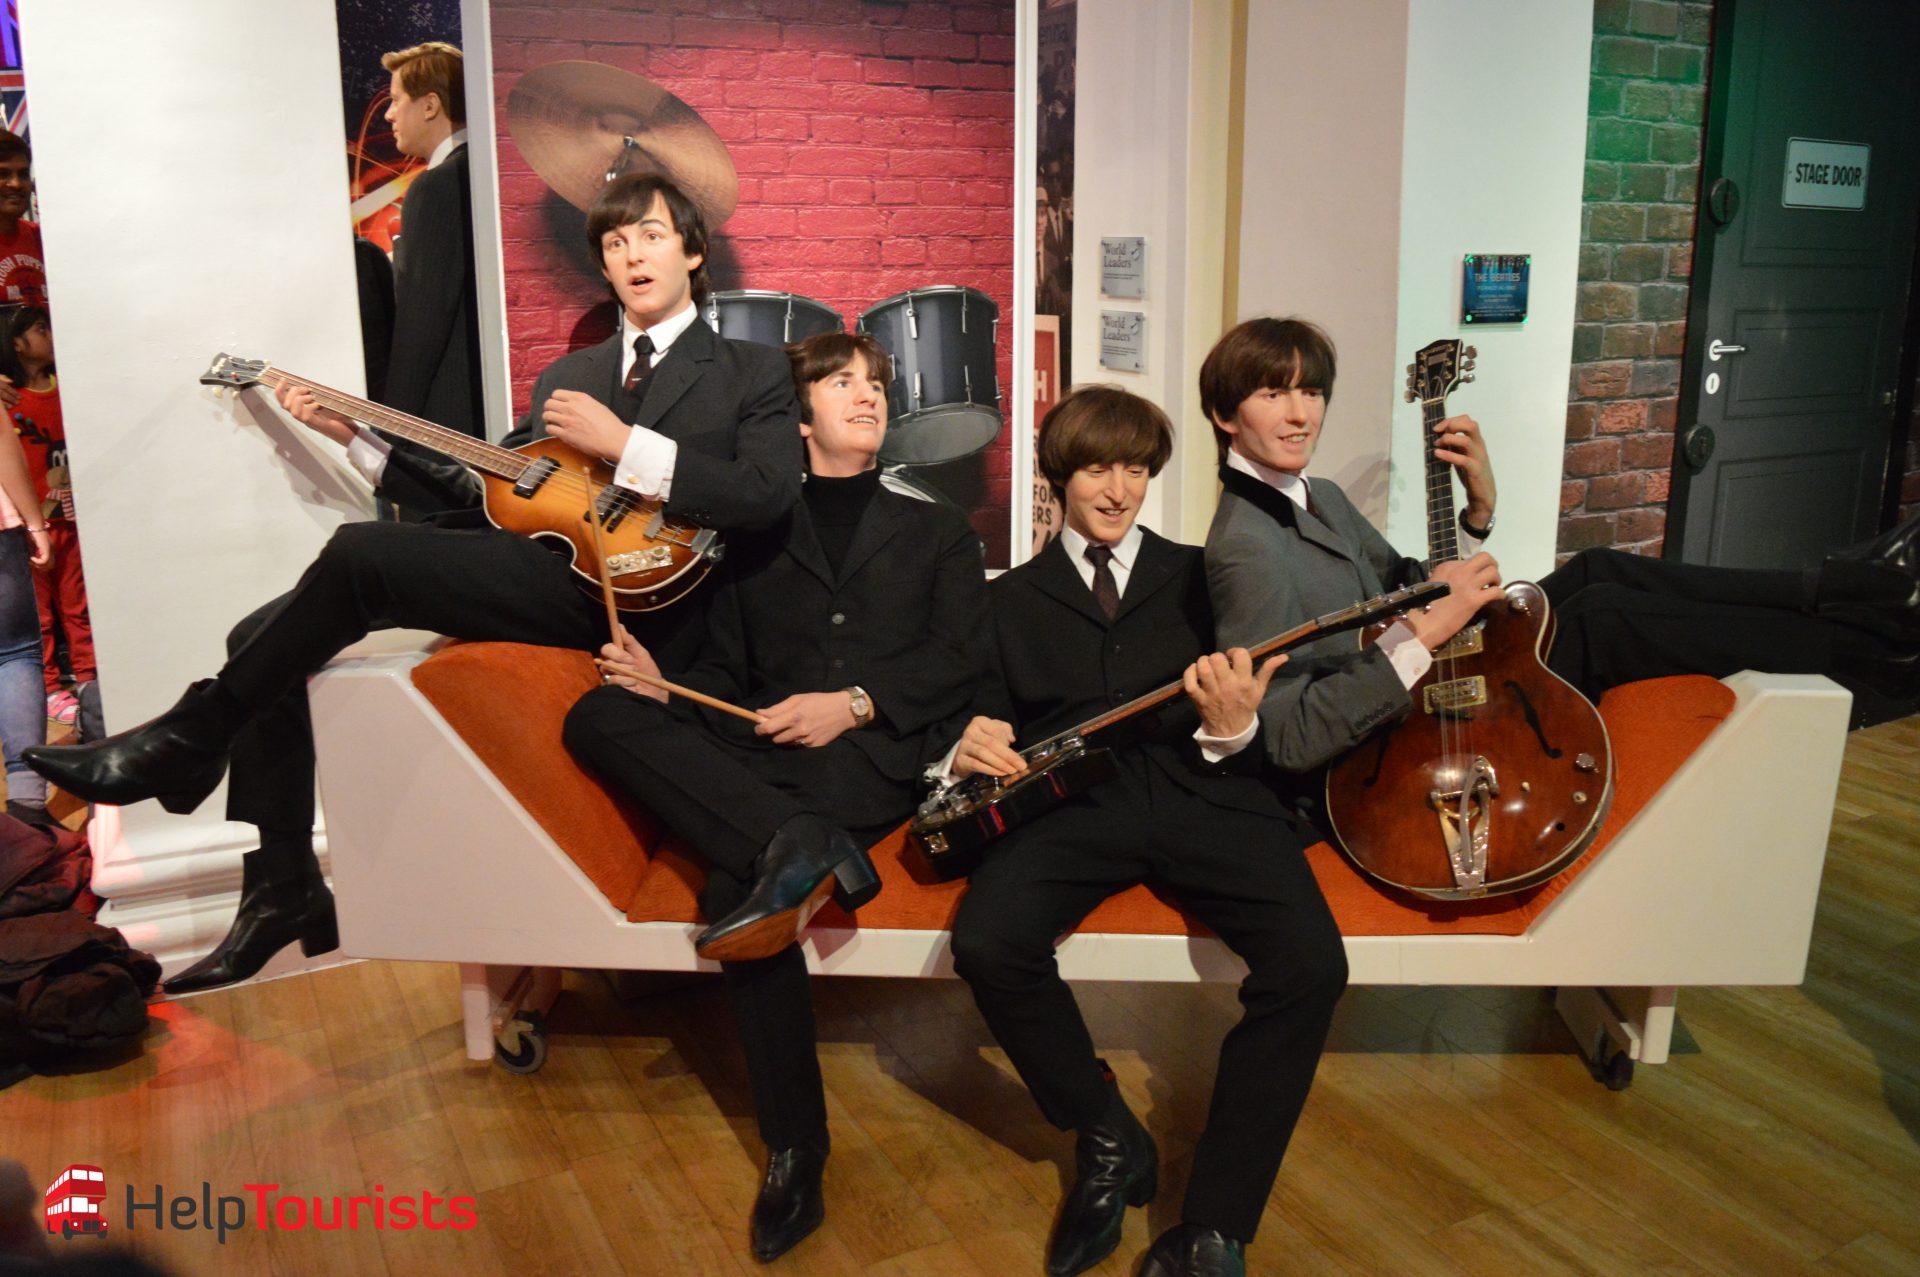 Madame Tussaud's London the Beatles